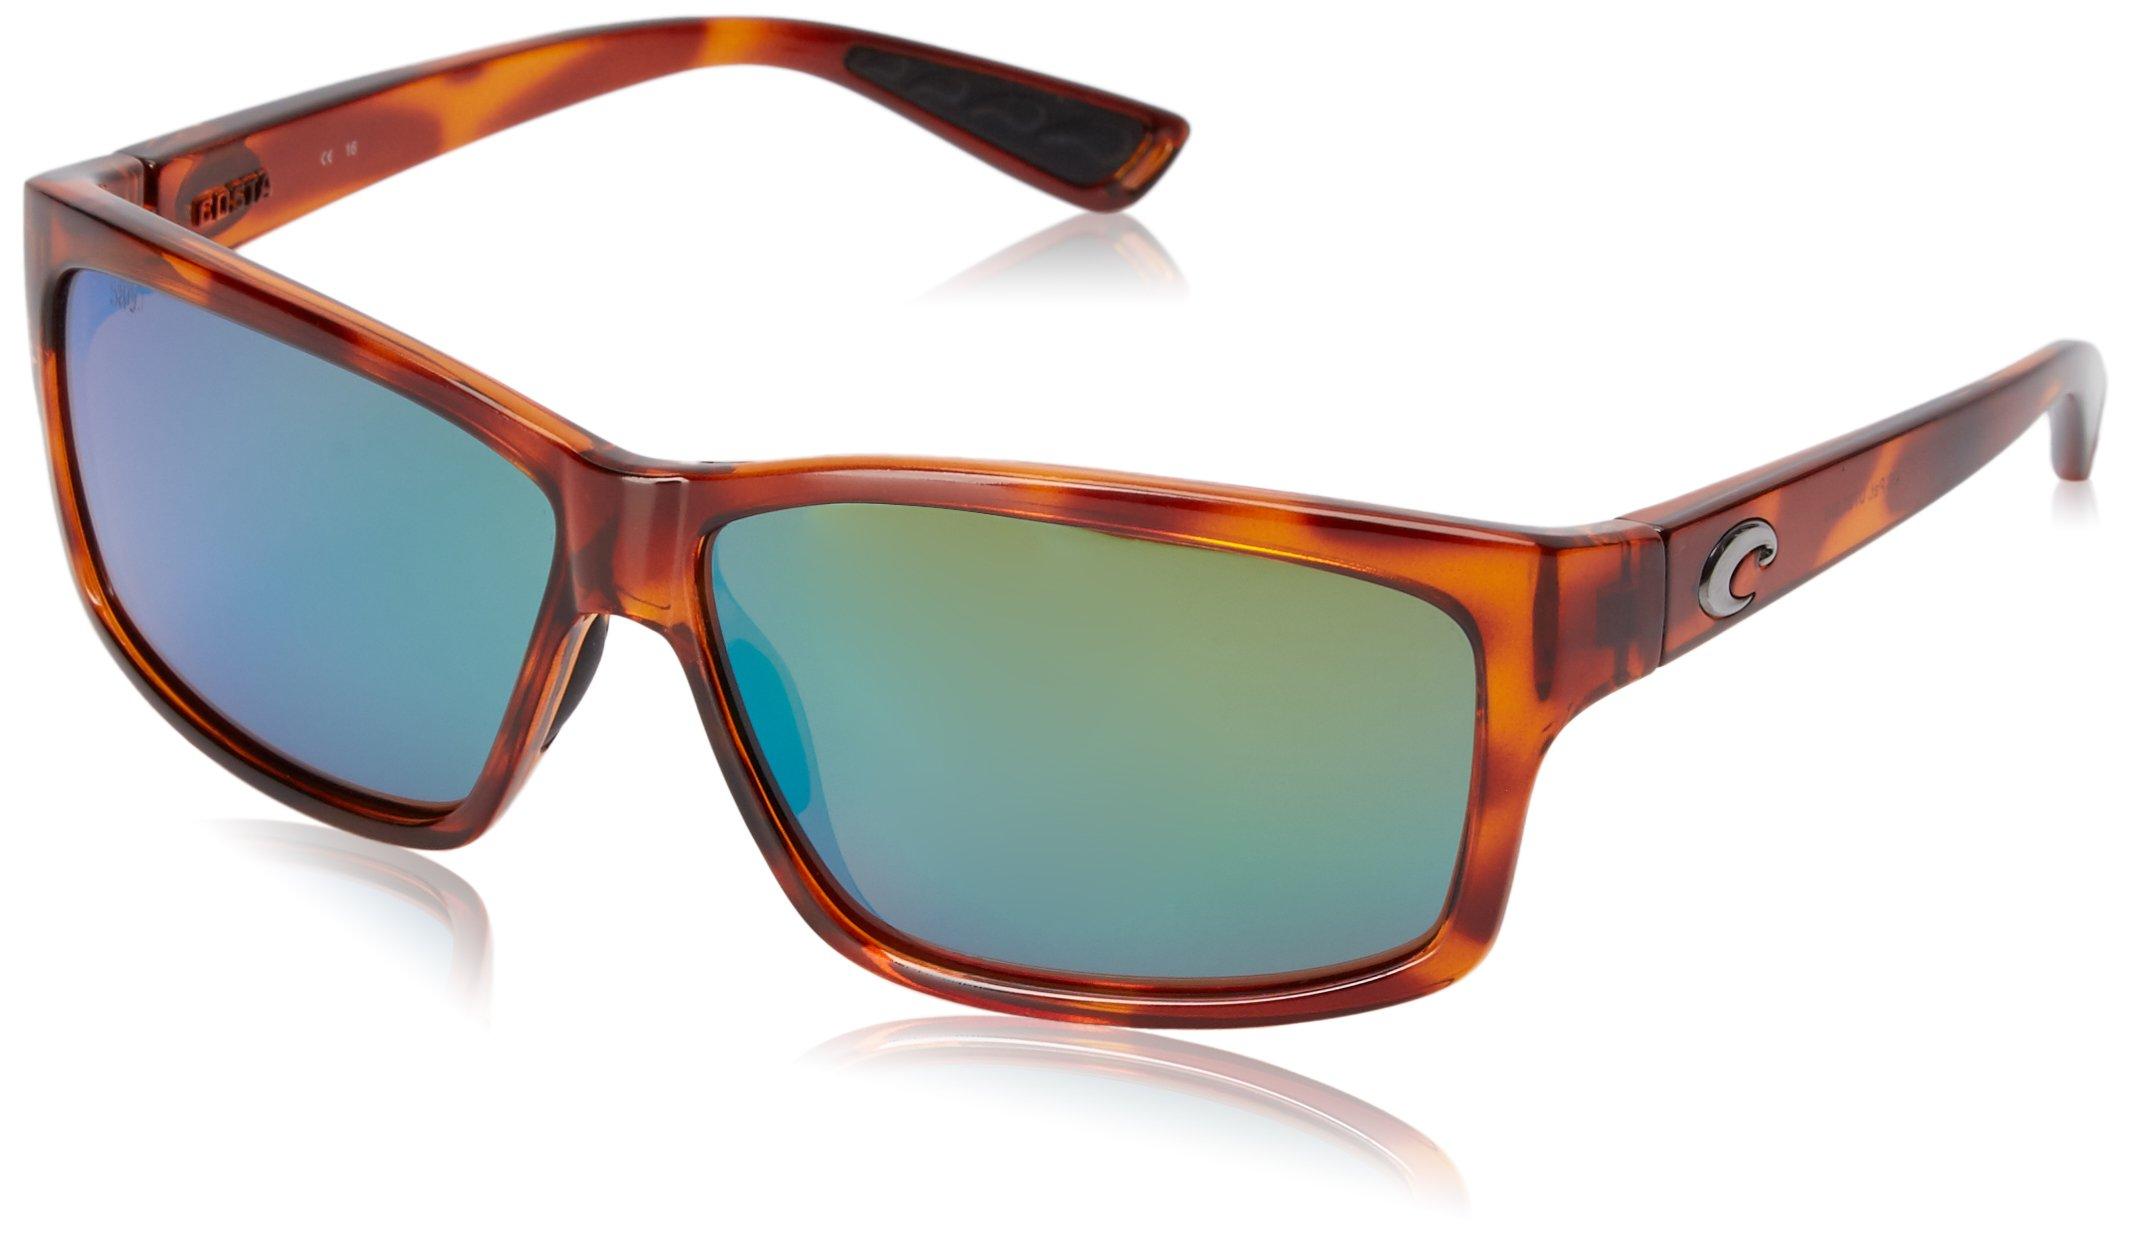 Costa del Mar Cut Polarized Rectangular Sunglasses, Honey Tortoise/Green Mirror 580 Glass by Costa Del Mar